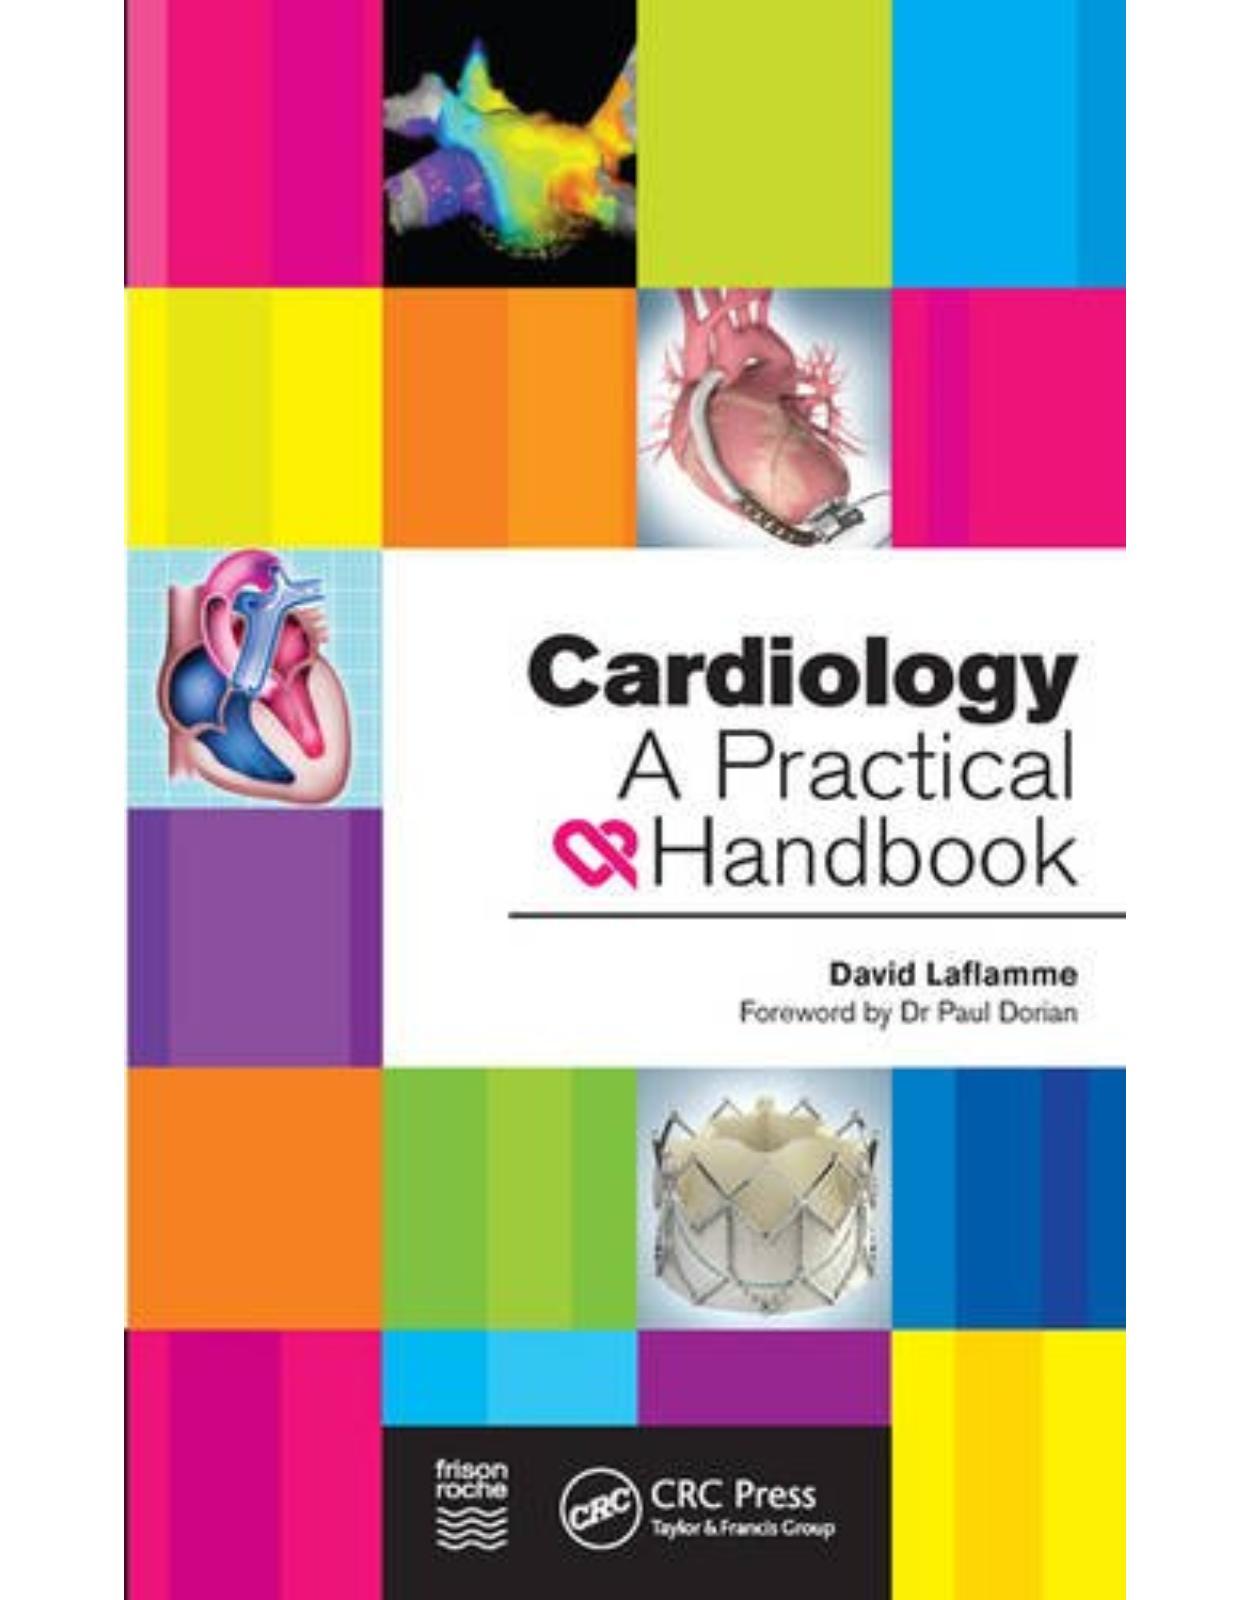 Cardiology: A Practical Handbook